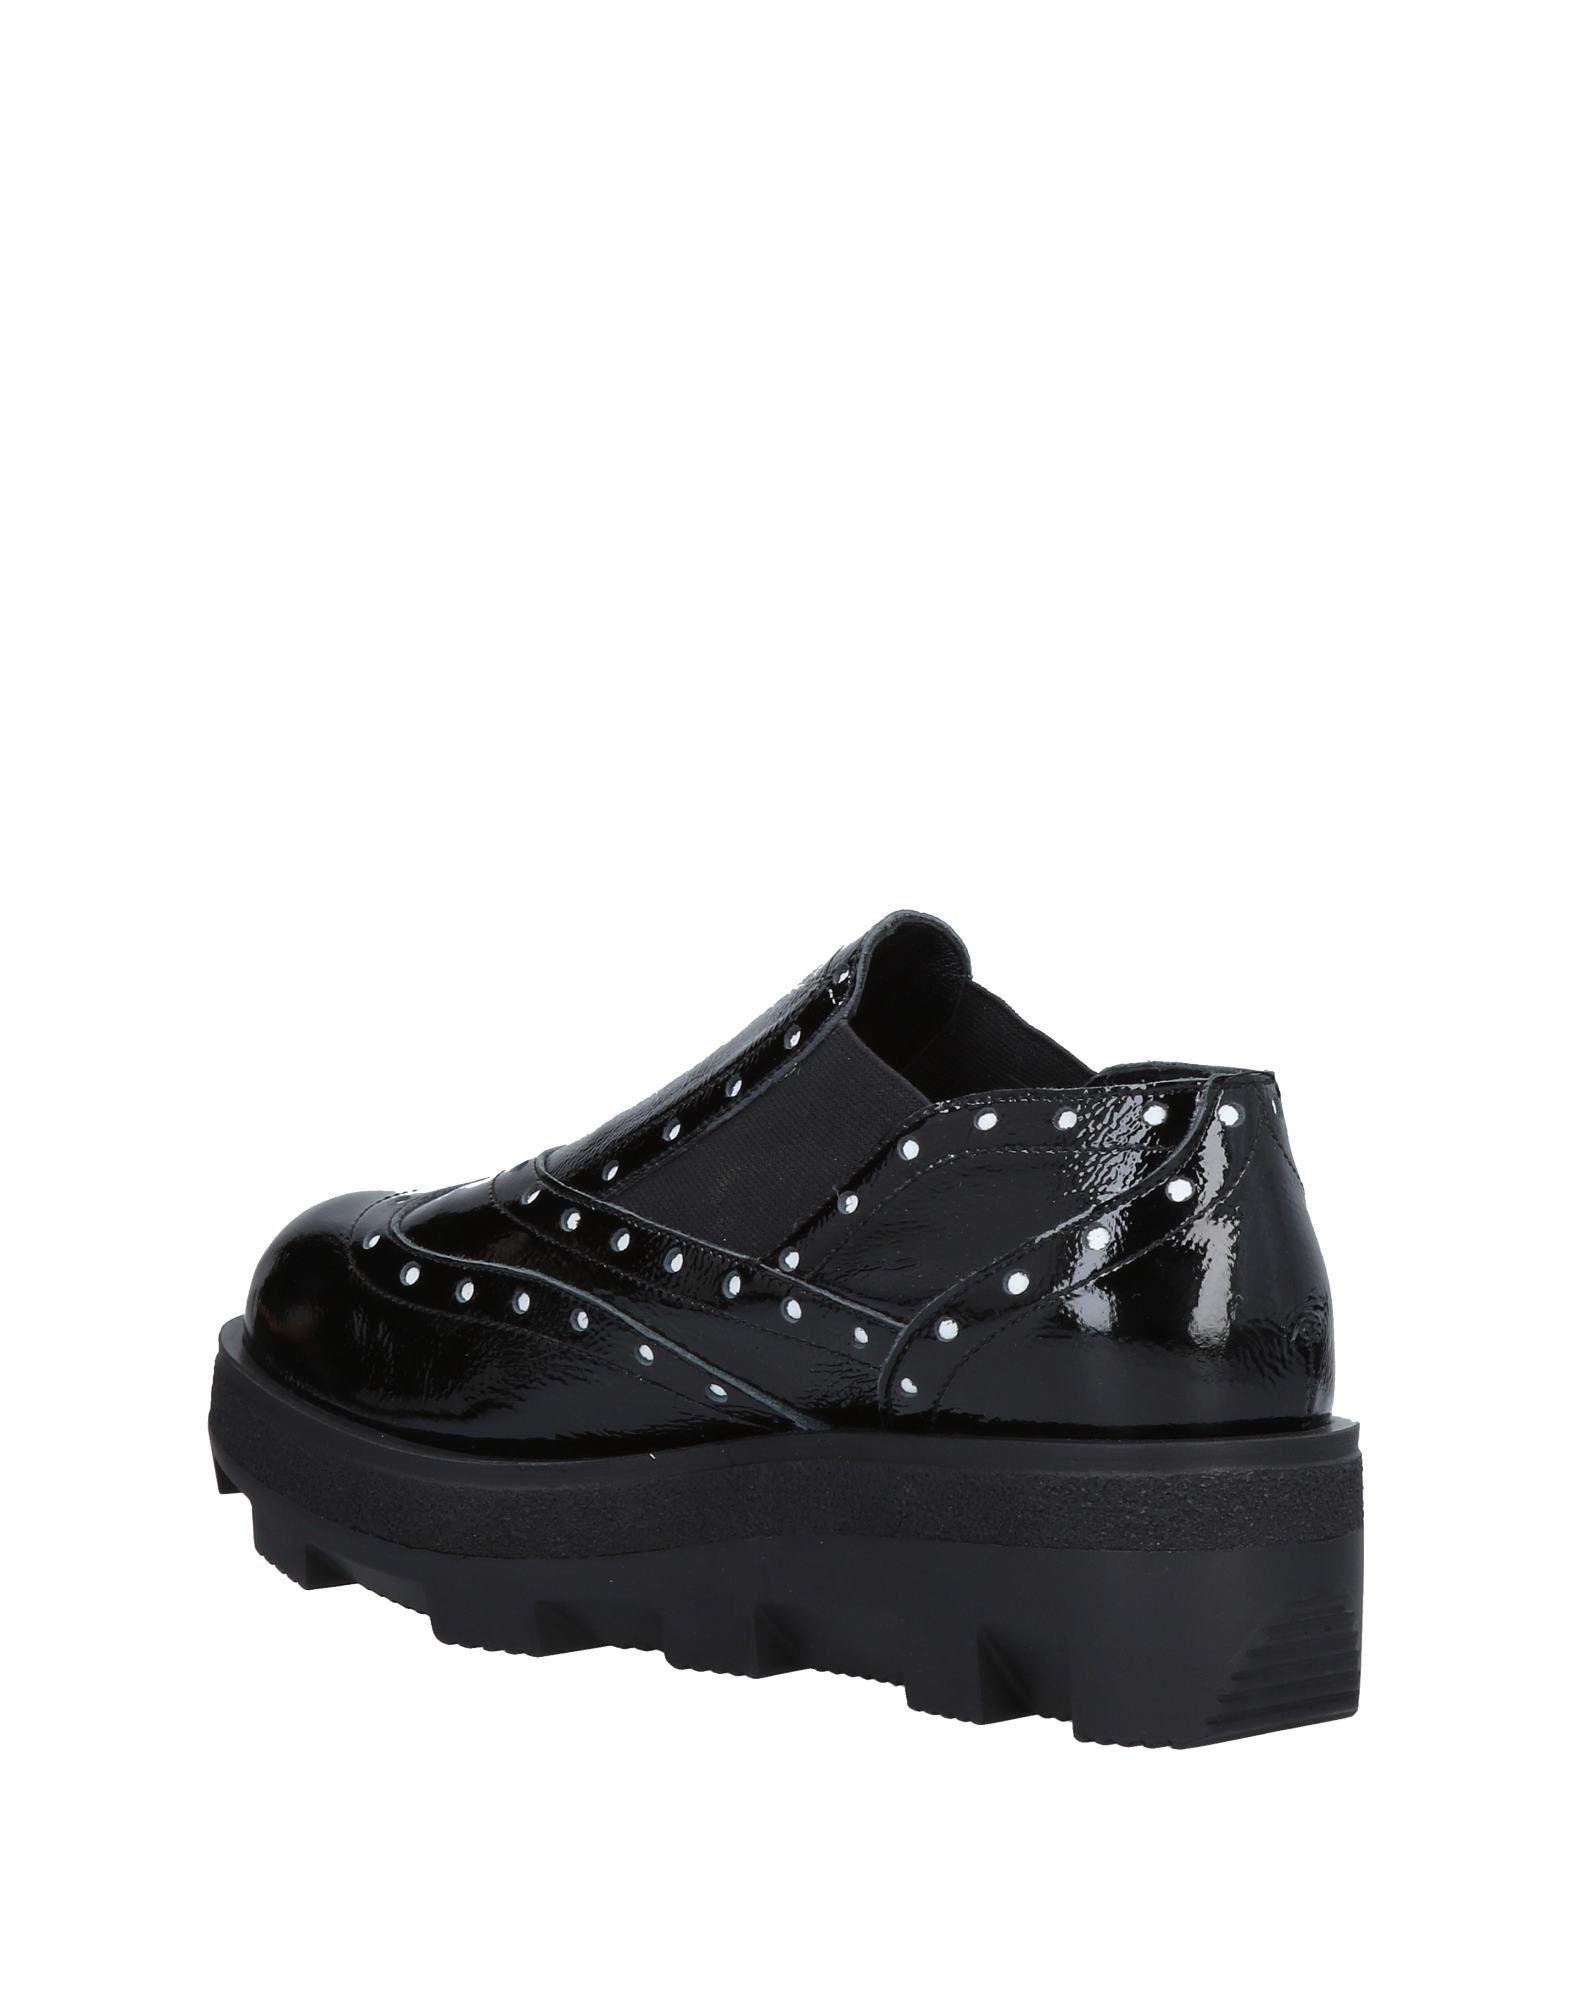 Horo 11476060NA Nero Sneakers Damen  11476060NA Horo Gute Qualität beliebte Schuhe ba139c